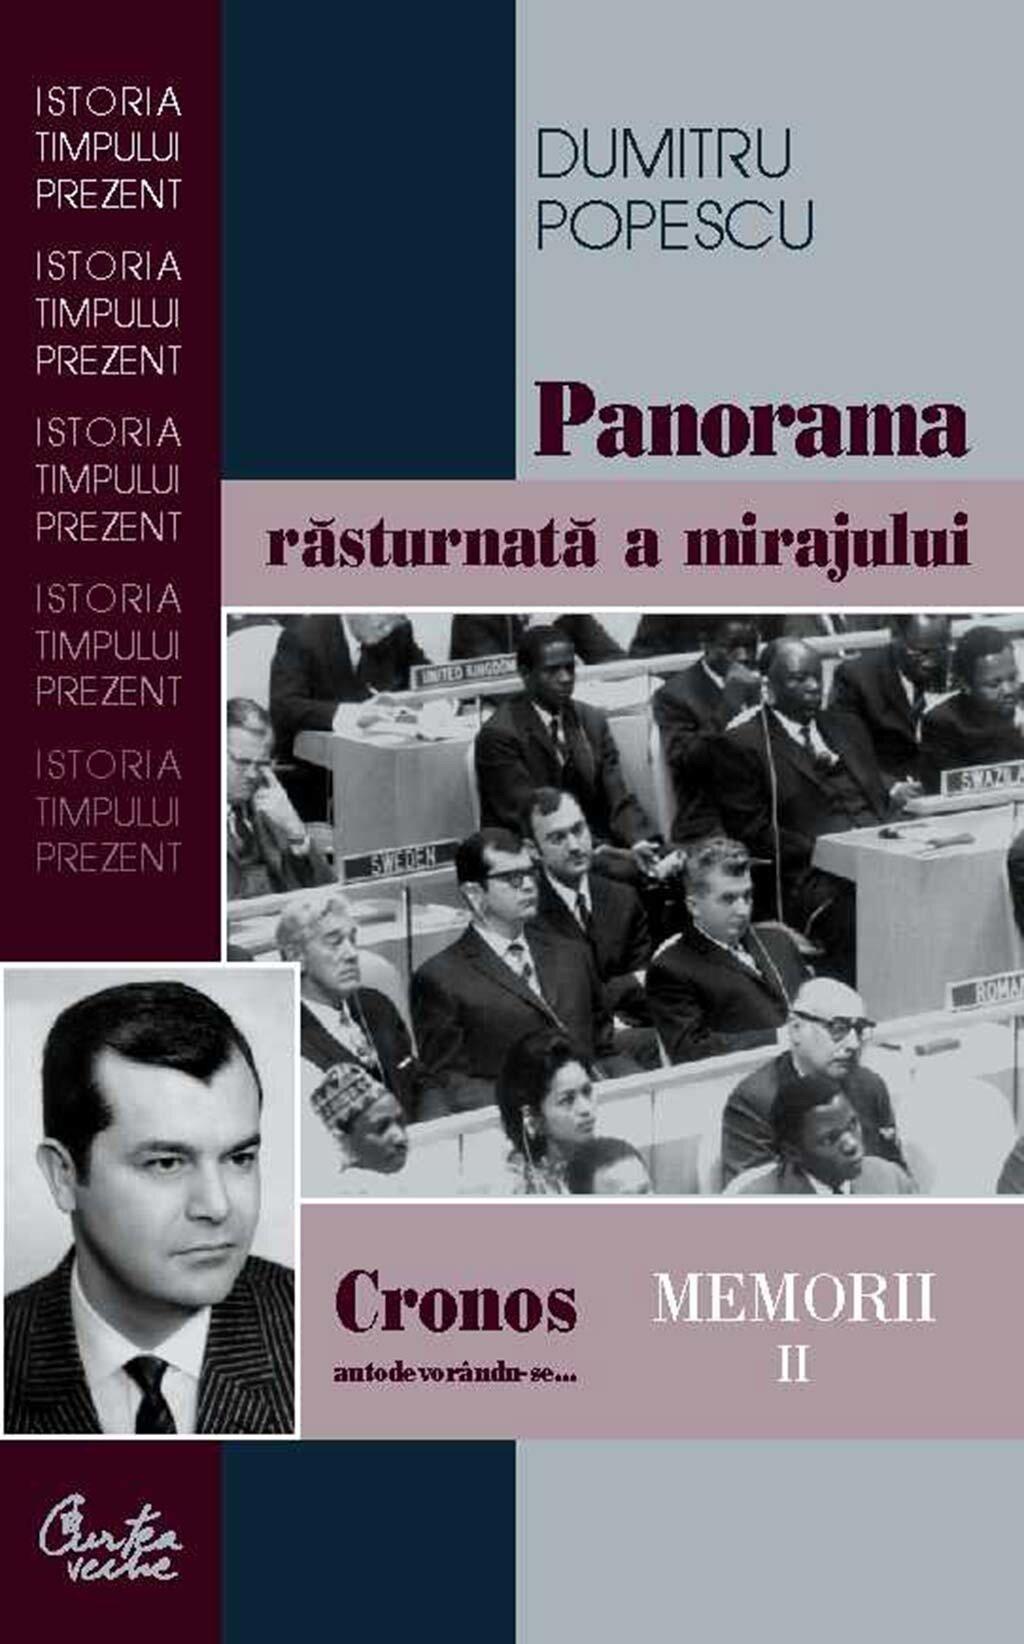 Cronos autodevorandu-se... Memorii vol. II. Panorama rasturnata a mirajului politic (eBook)